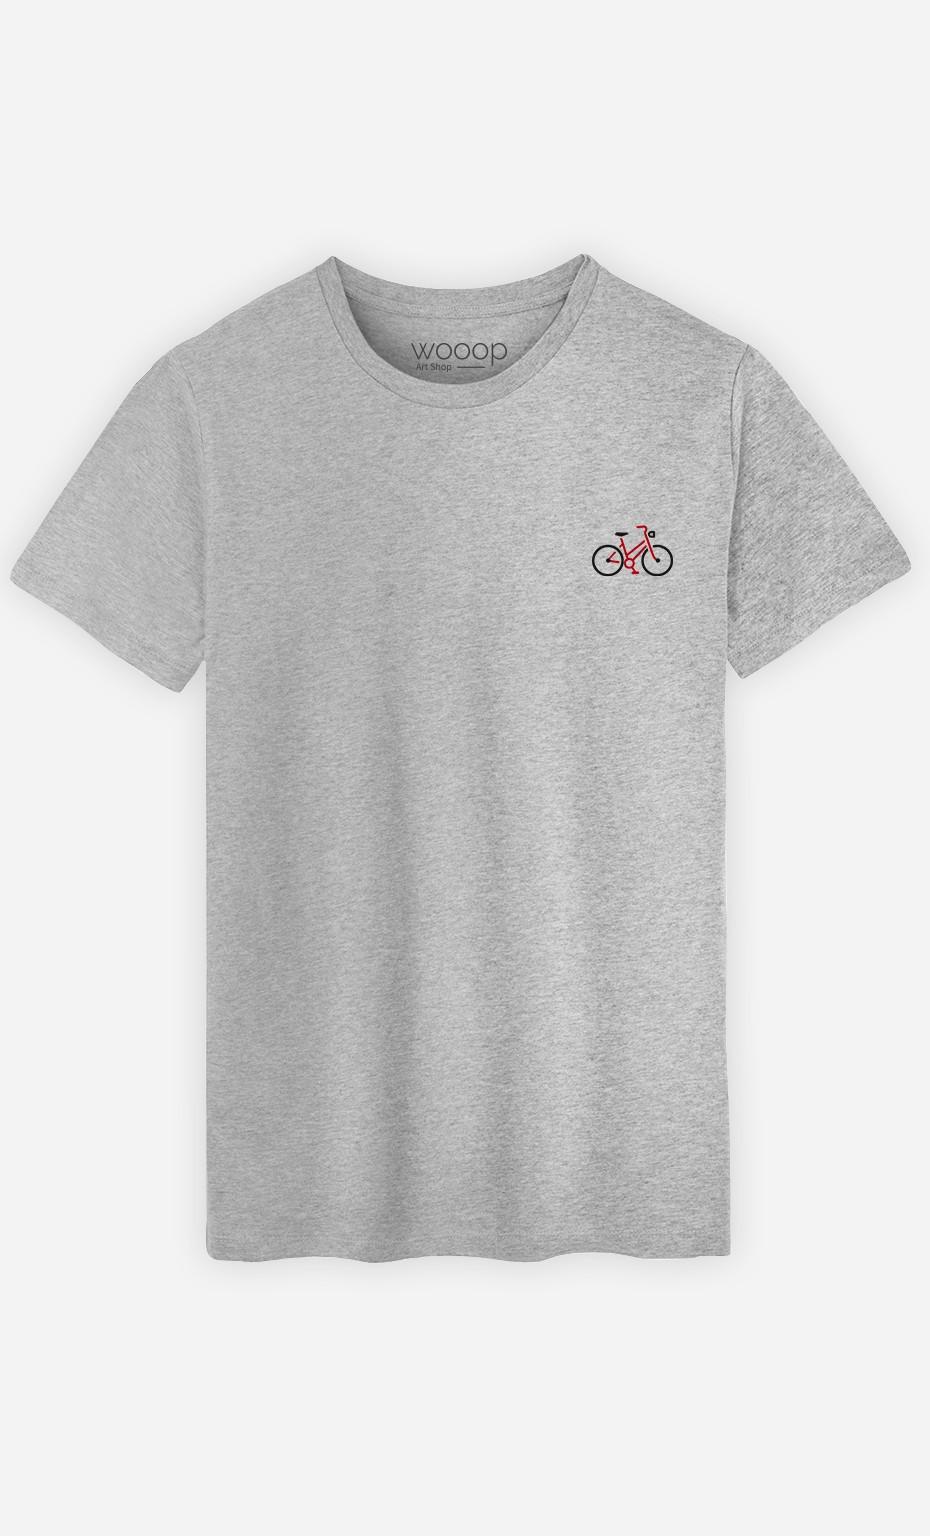 T-Shirt Homme Vélo